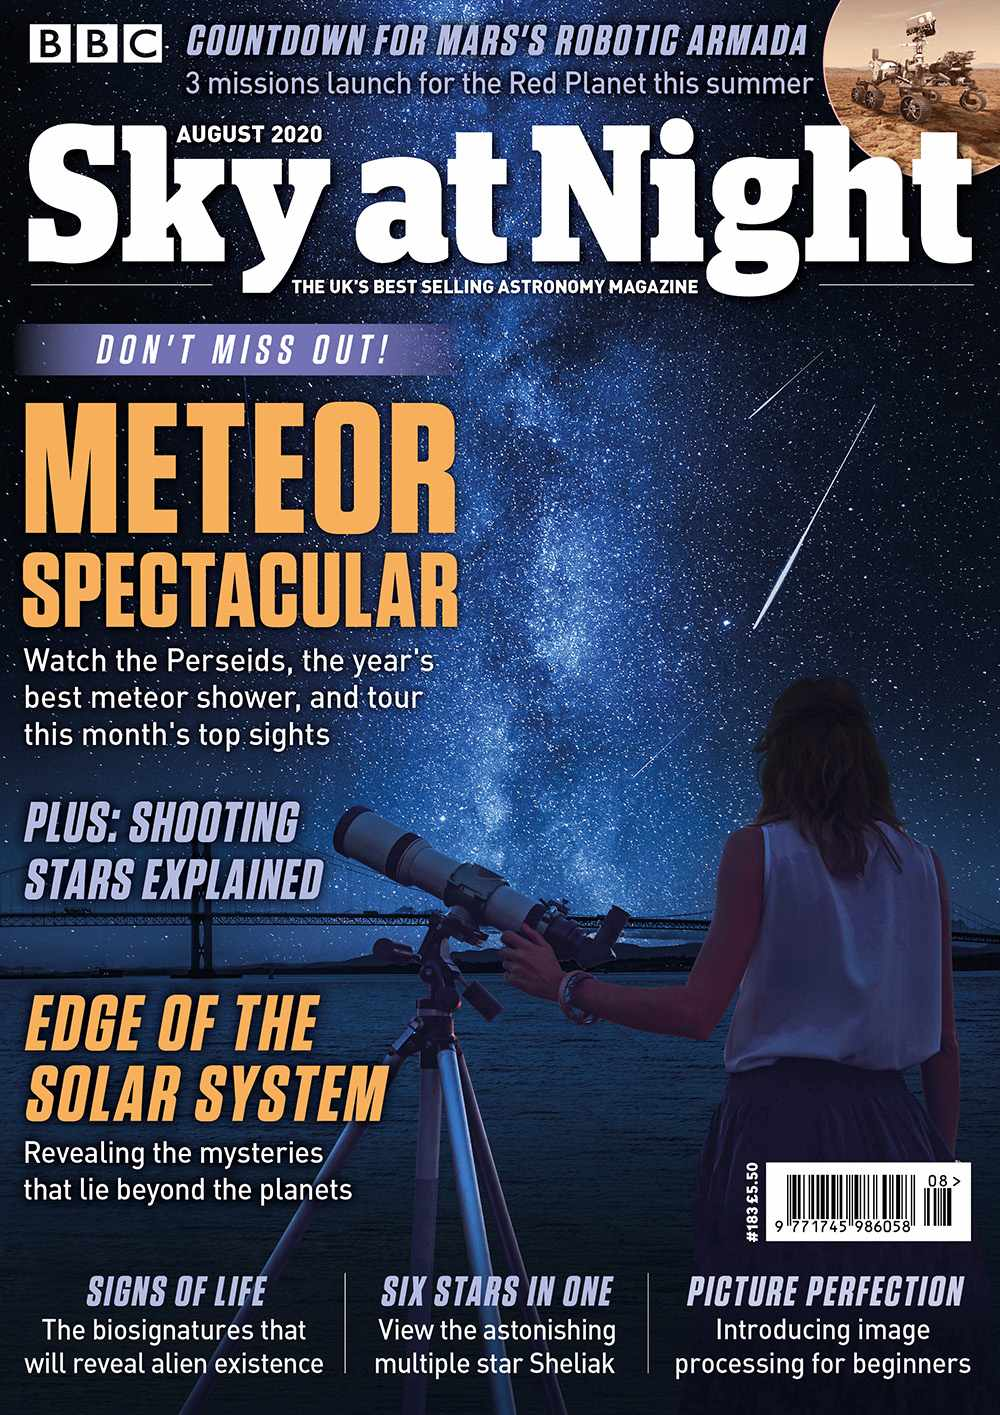 BBC Sky at Night Magazine August 2020 issue